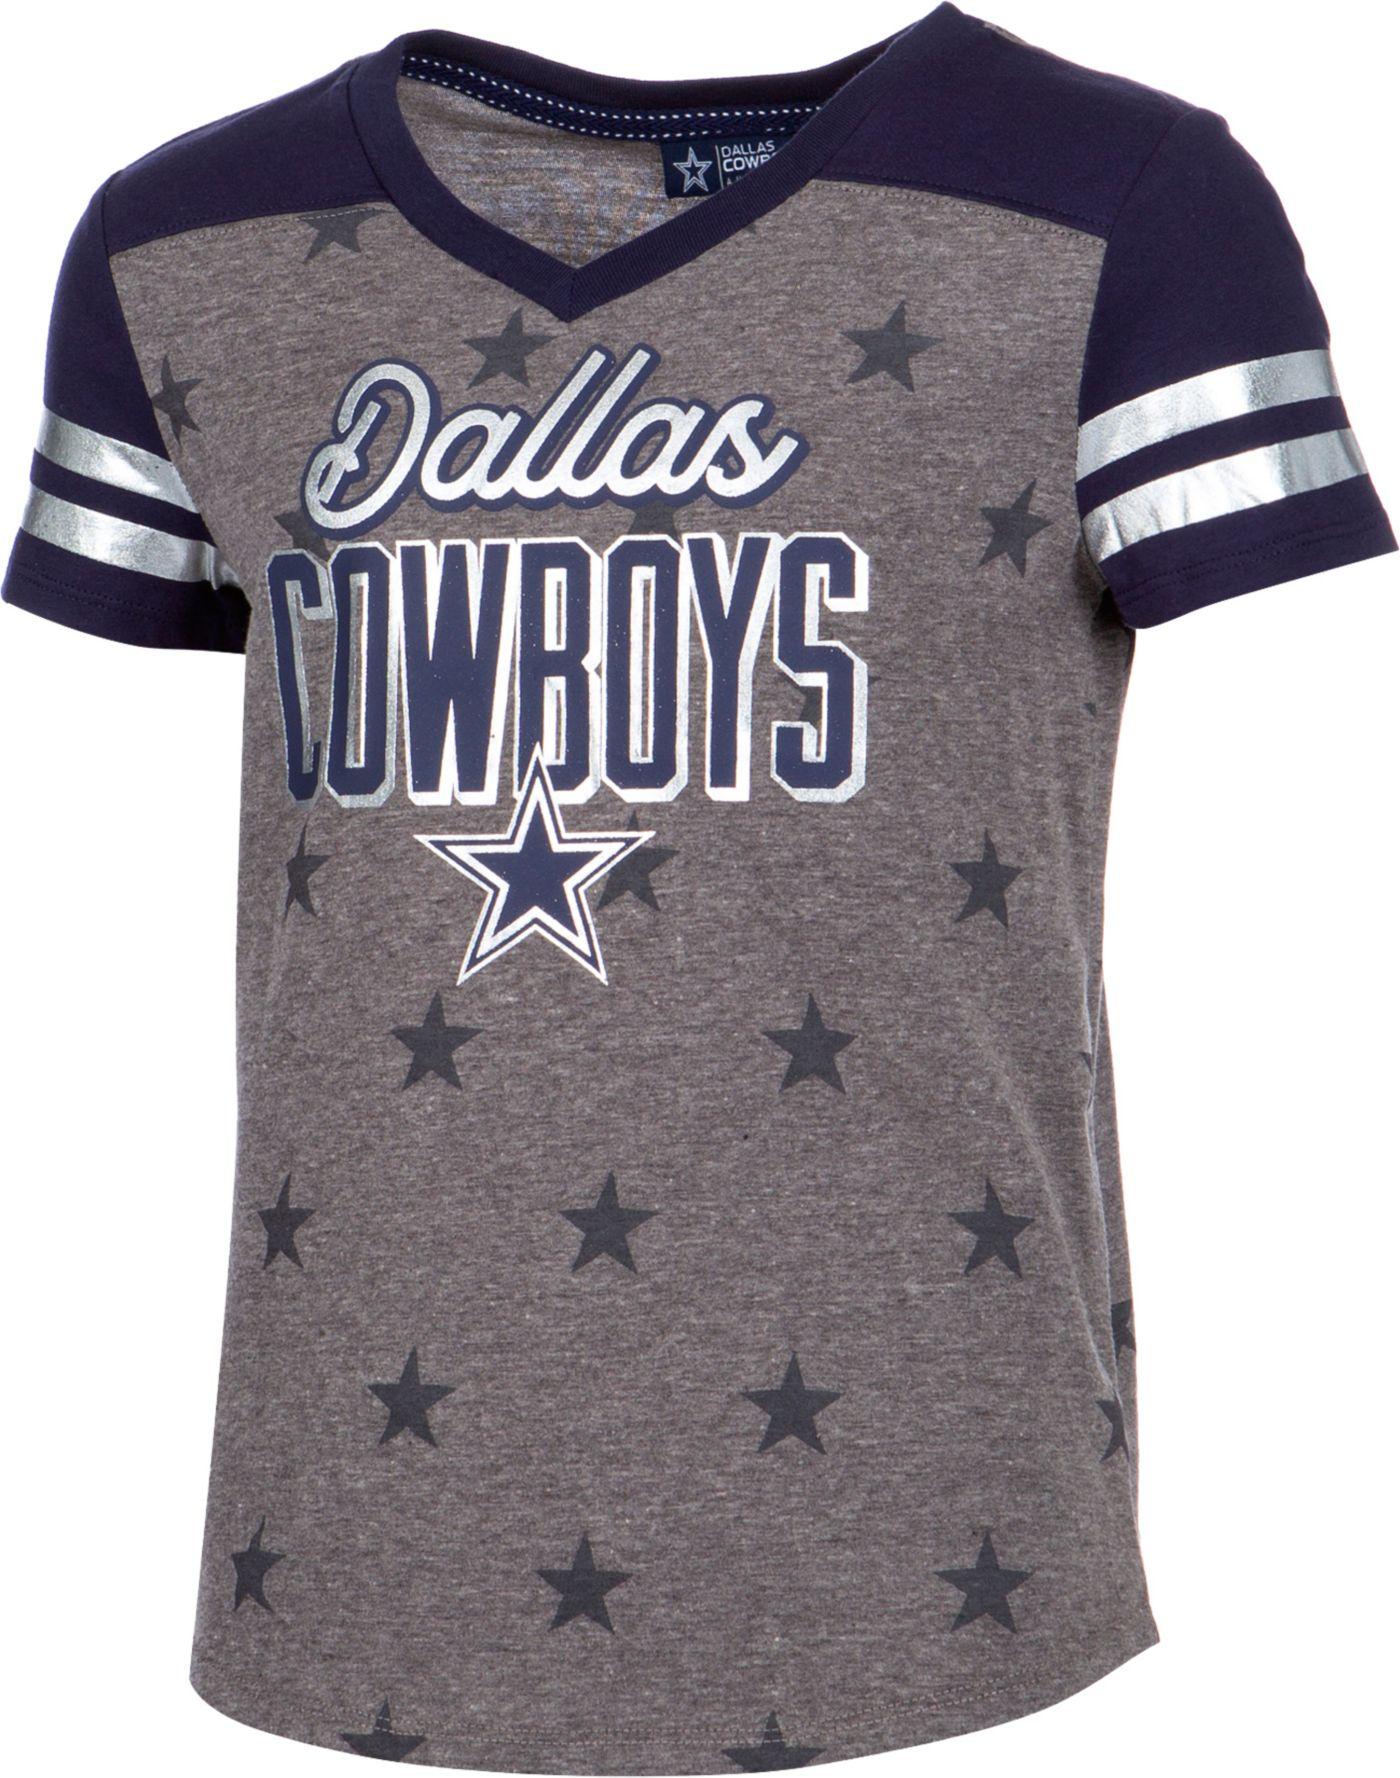 Dallas Cowboys Merchandising Girls' Stars Grey T-Shirt